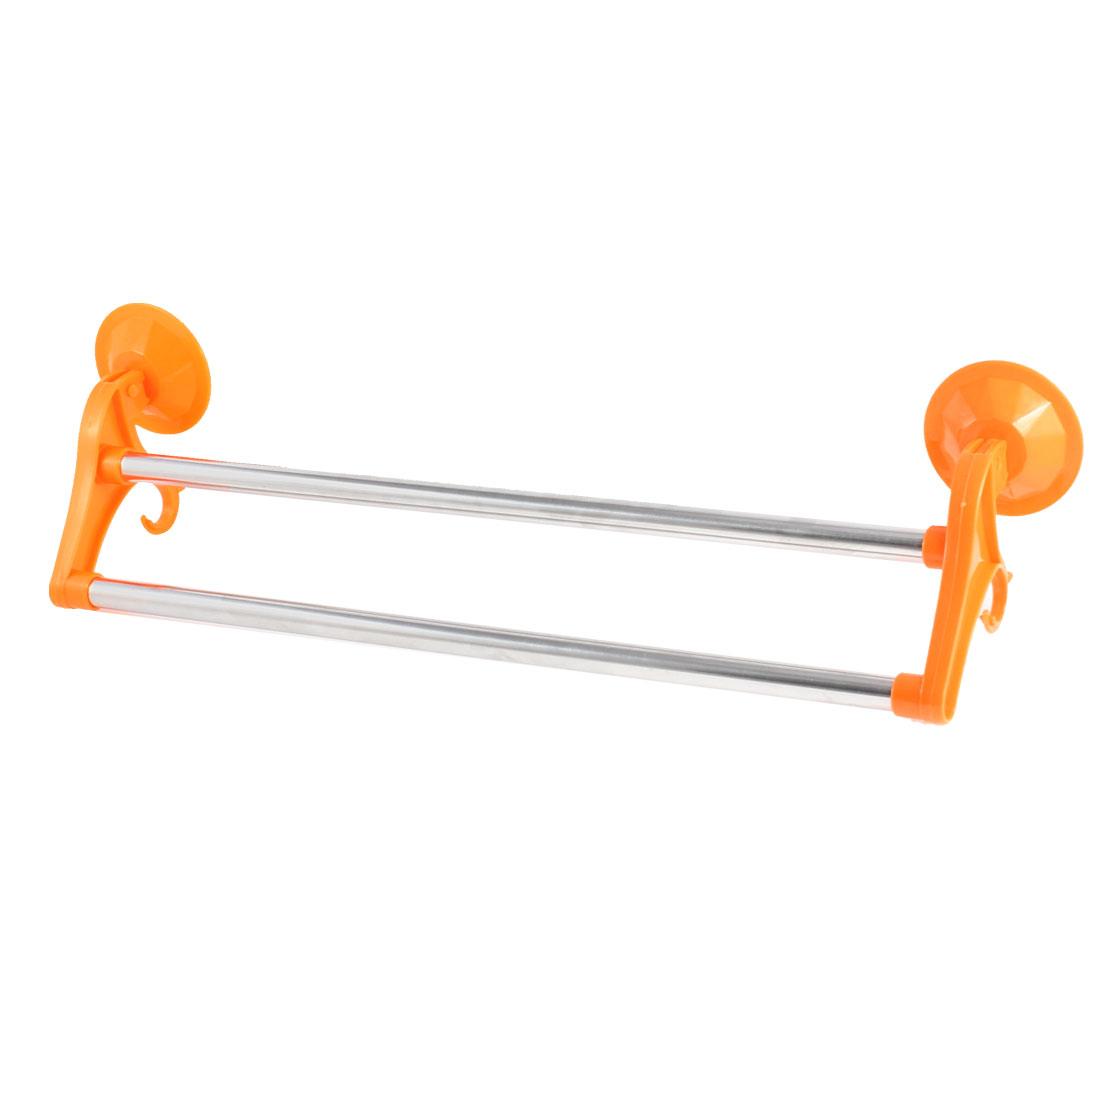 Hotel Bathroom Lavatory Suction Cup Double Towel Bar Rack Hanger Orange